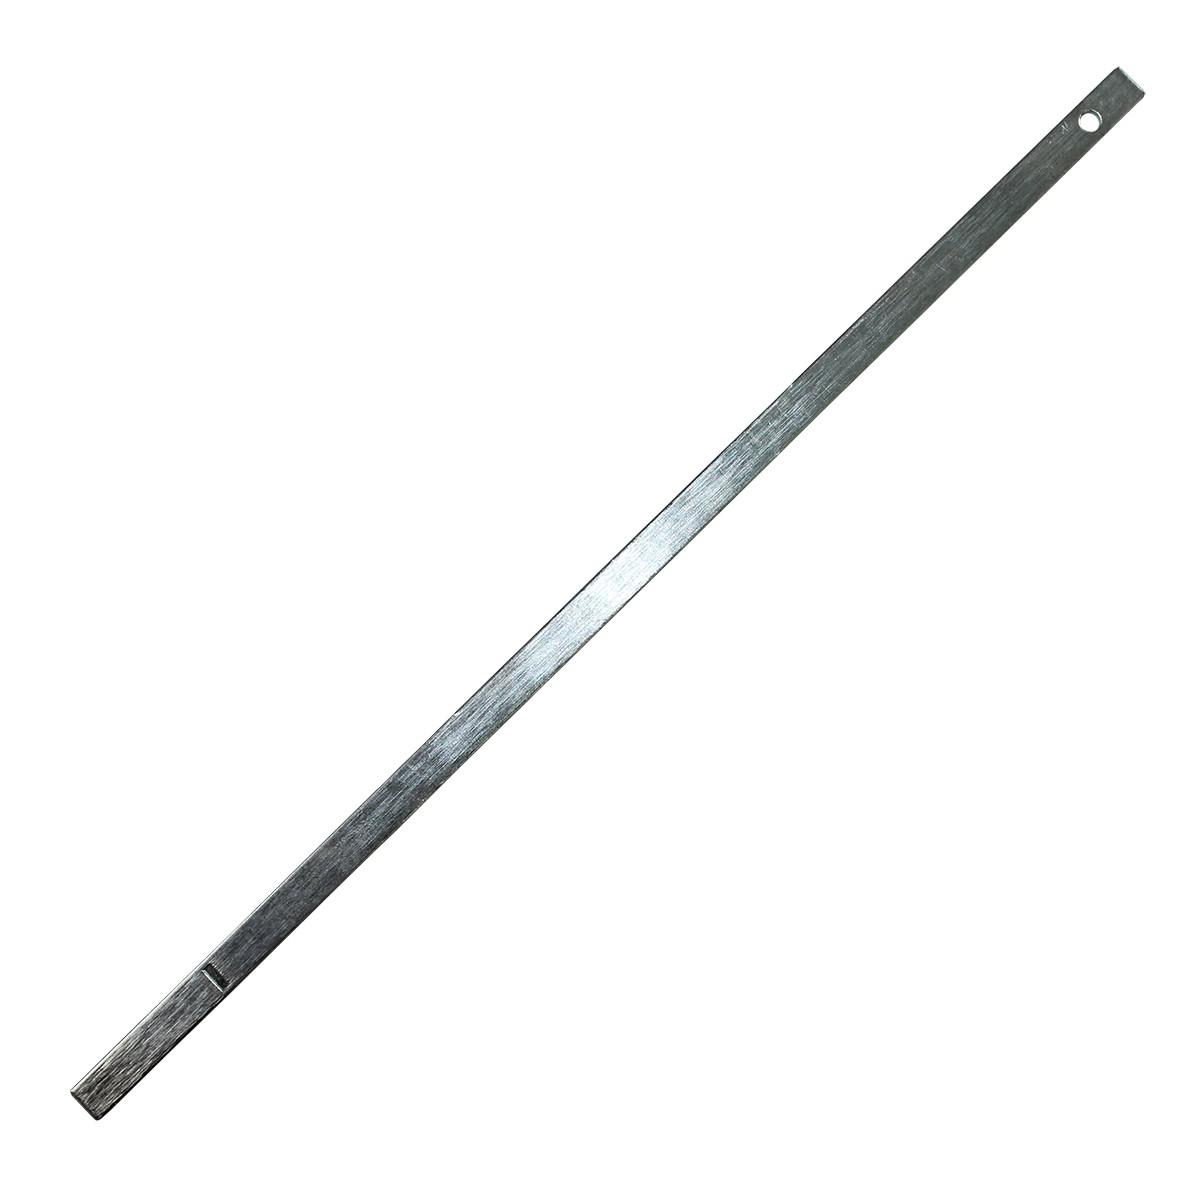 Solidscape Tank Measuring Stick - Dipstick